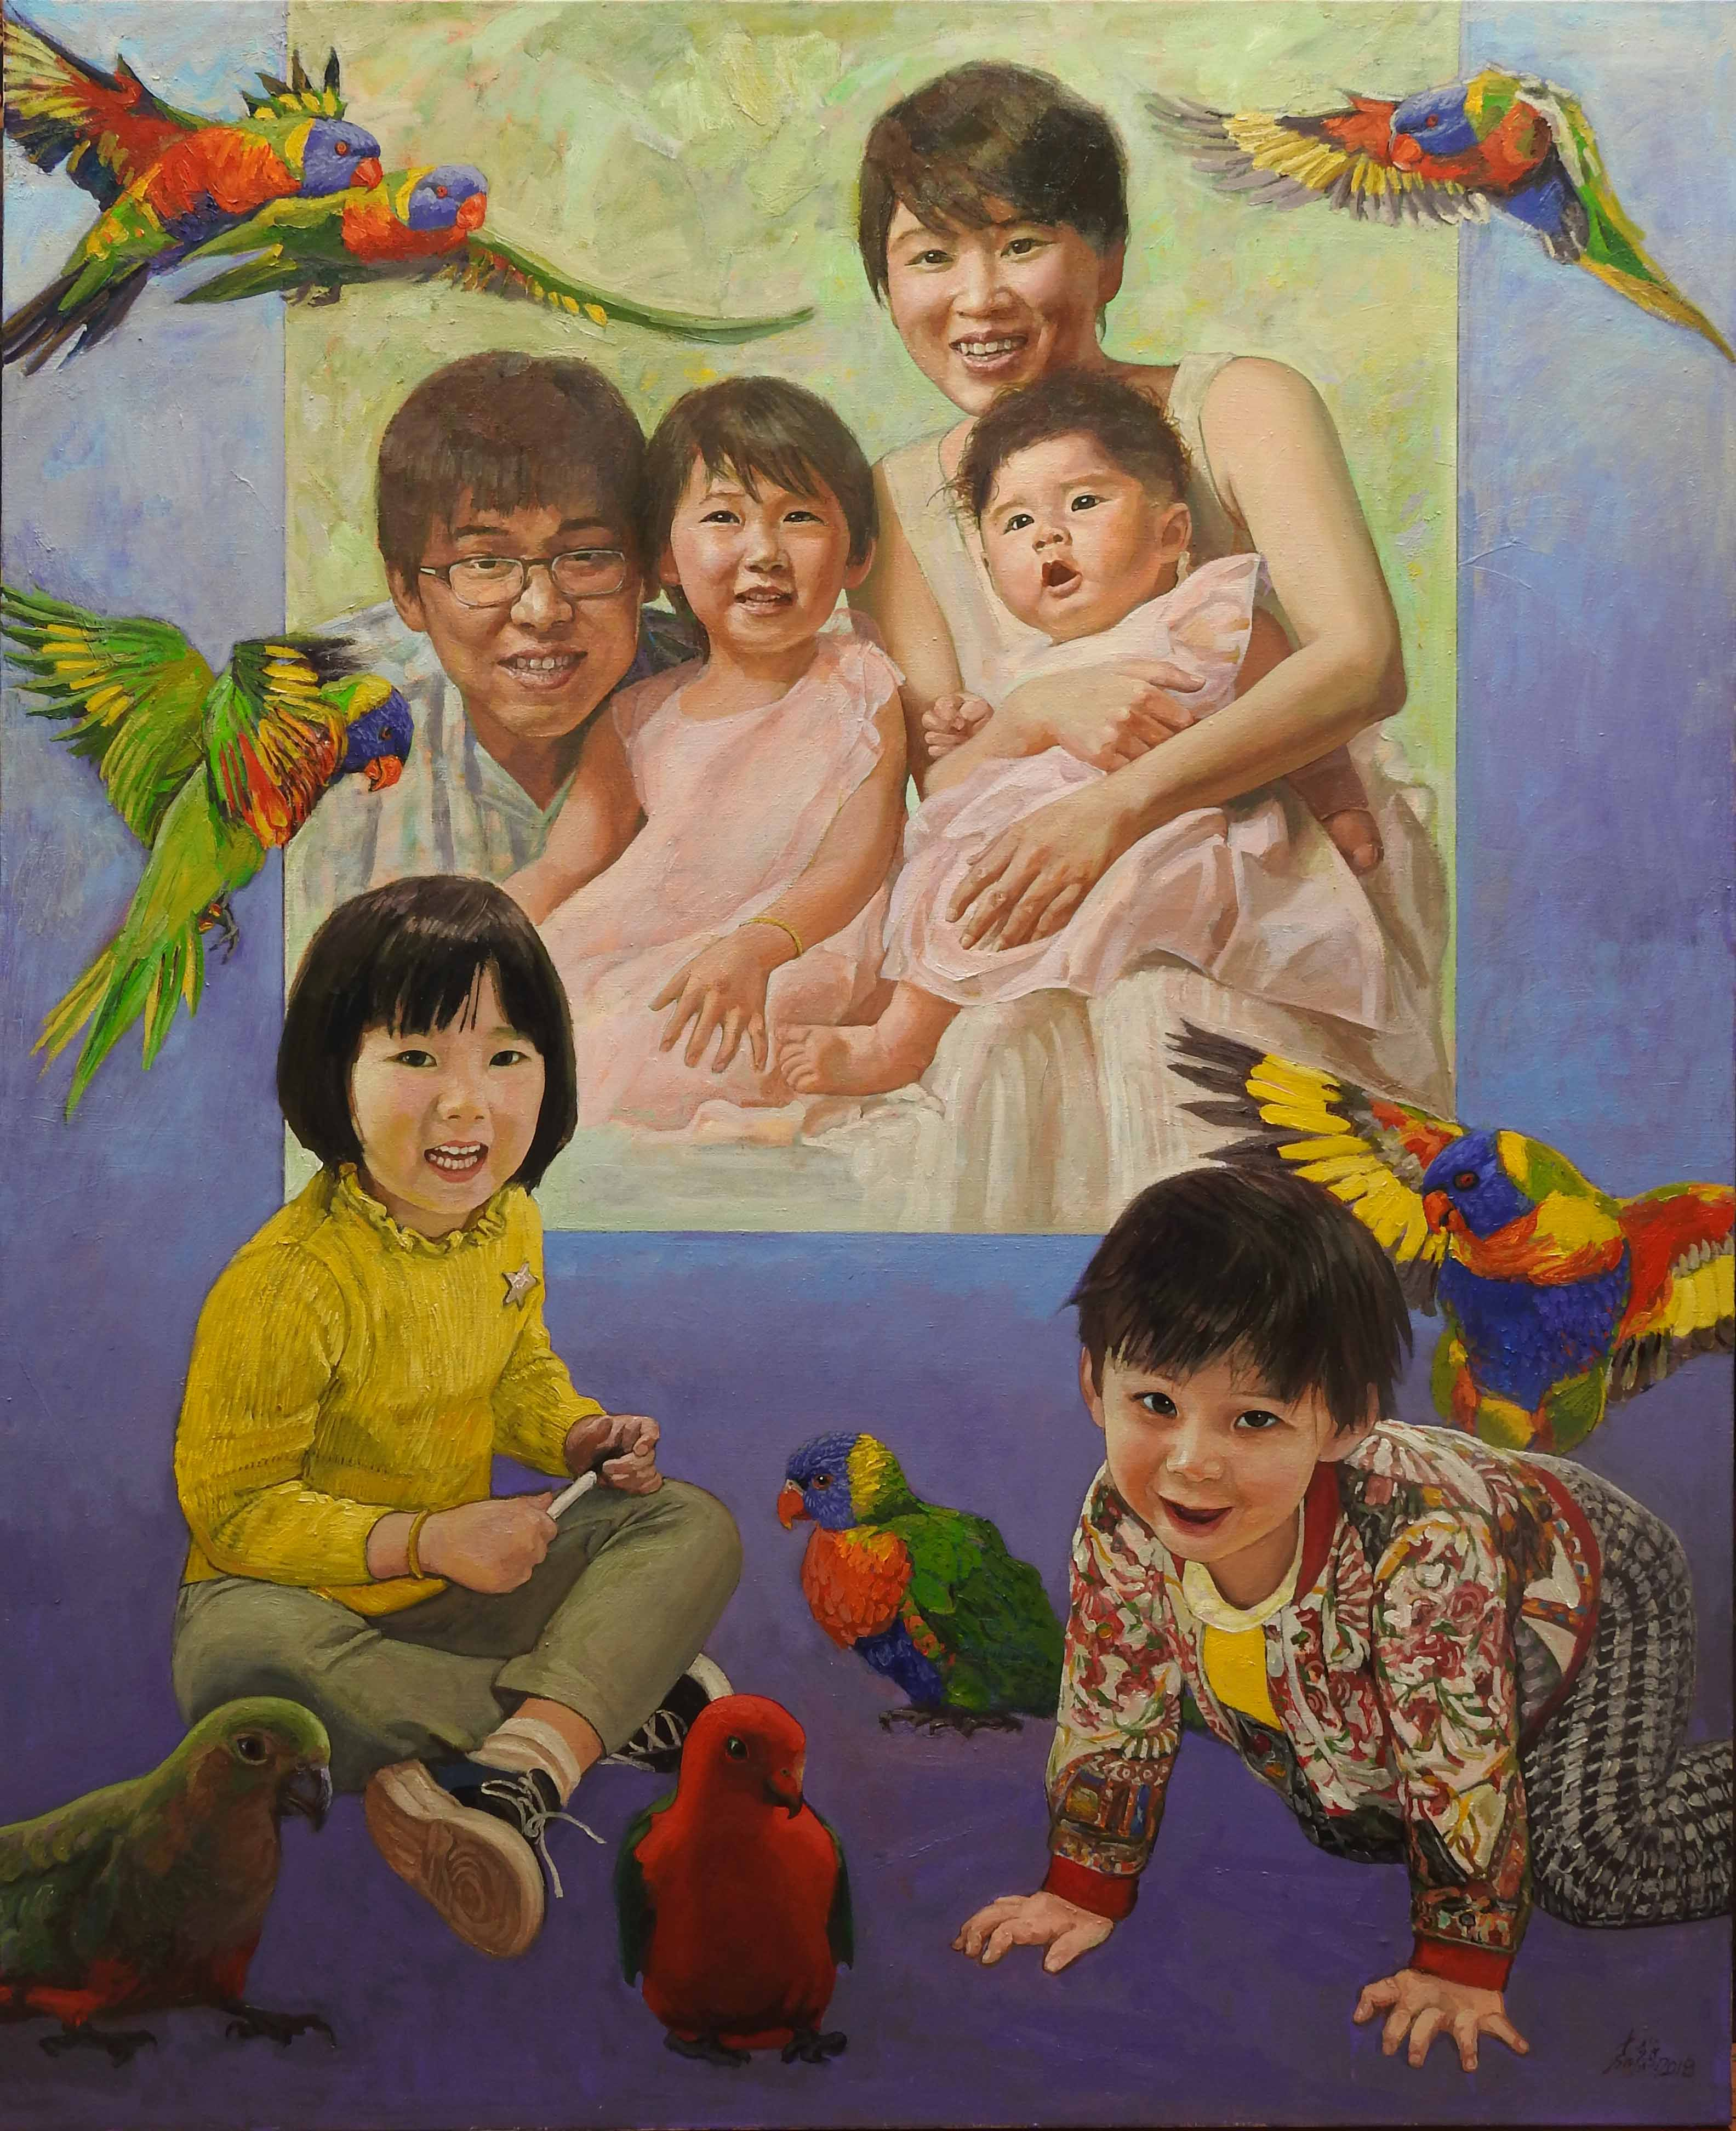 14 Madan Family马丹一家(2018) Oil on canvas, 167 x 137cm